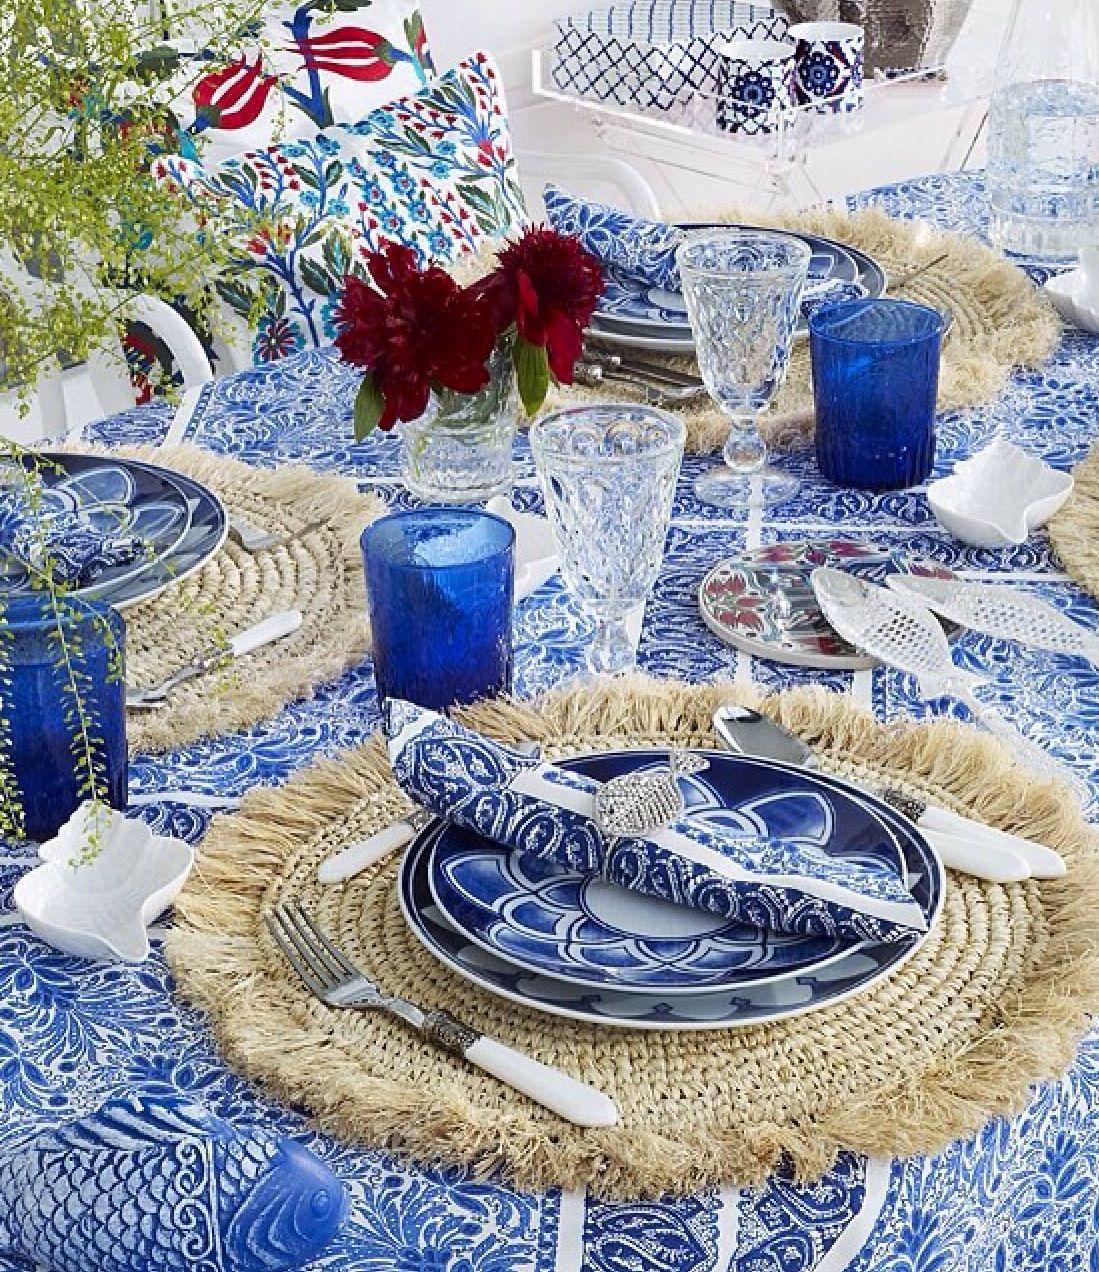 Beach party table decorations zara home  inditex  pinterest